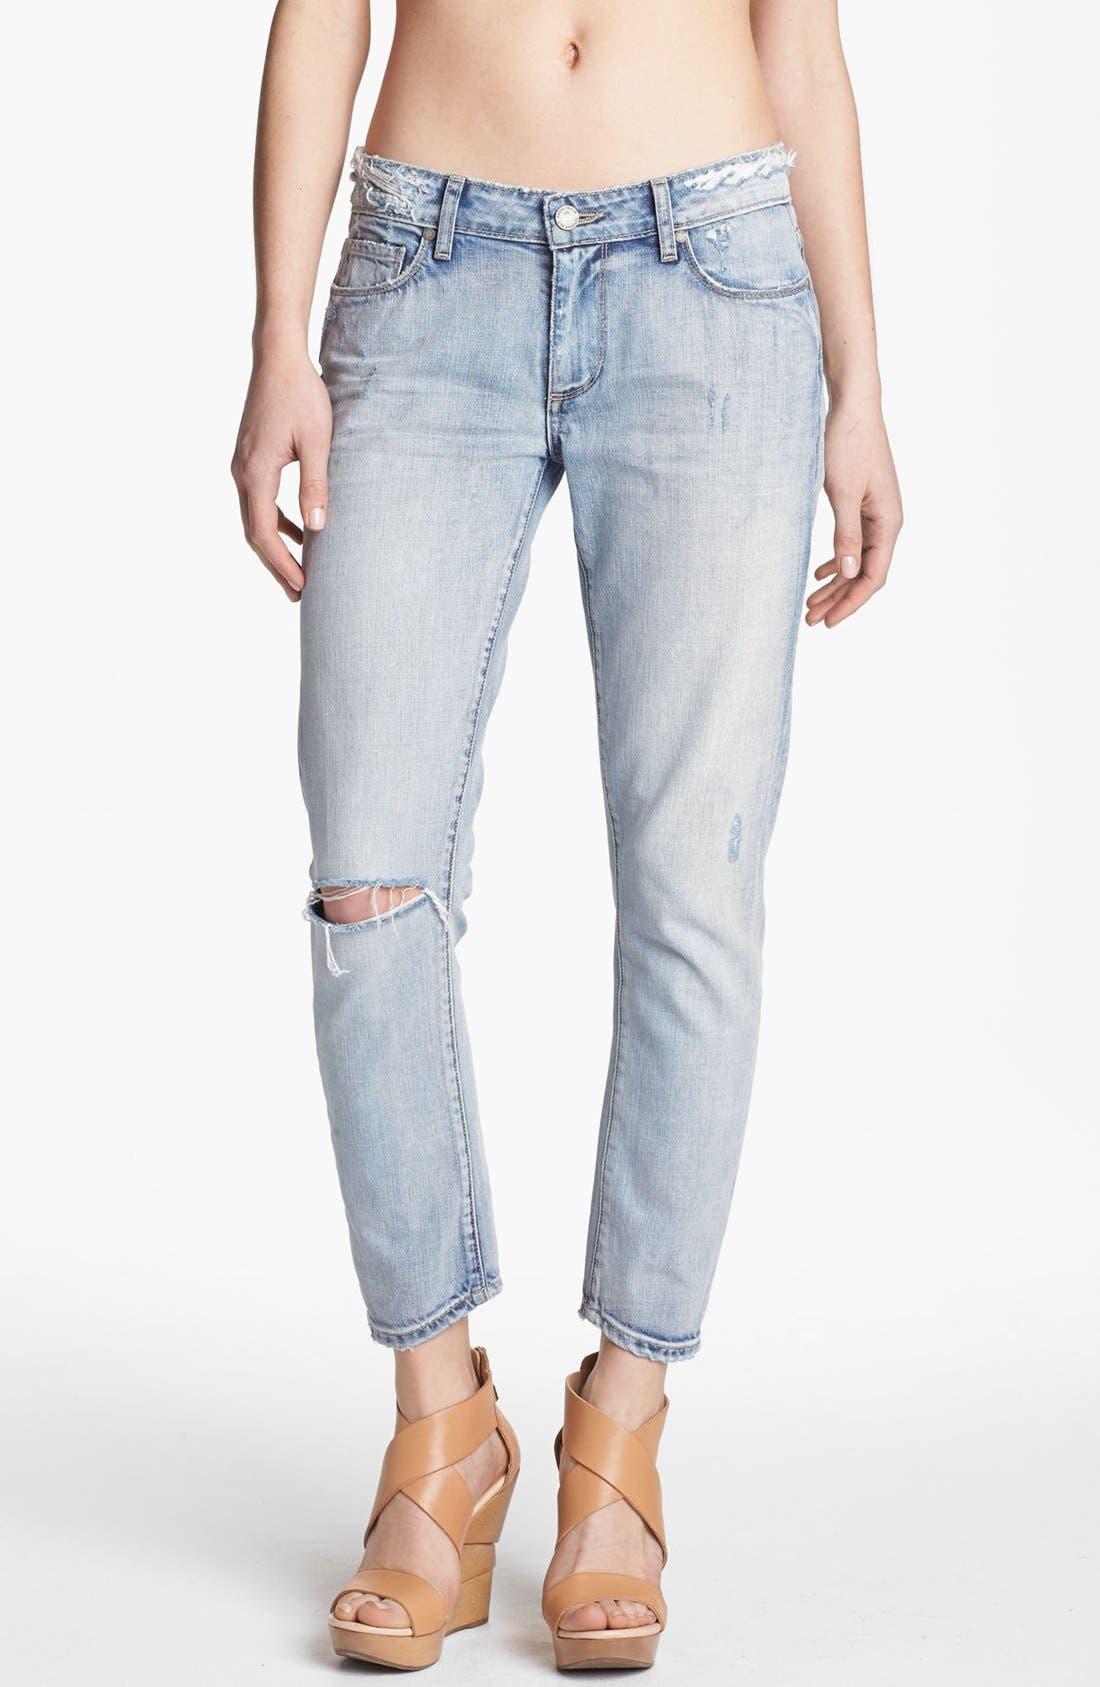 Alternate Image 1 Selected - Paige Denim 'Lydia' Crop Jeans (Pilot)